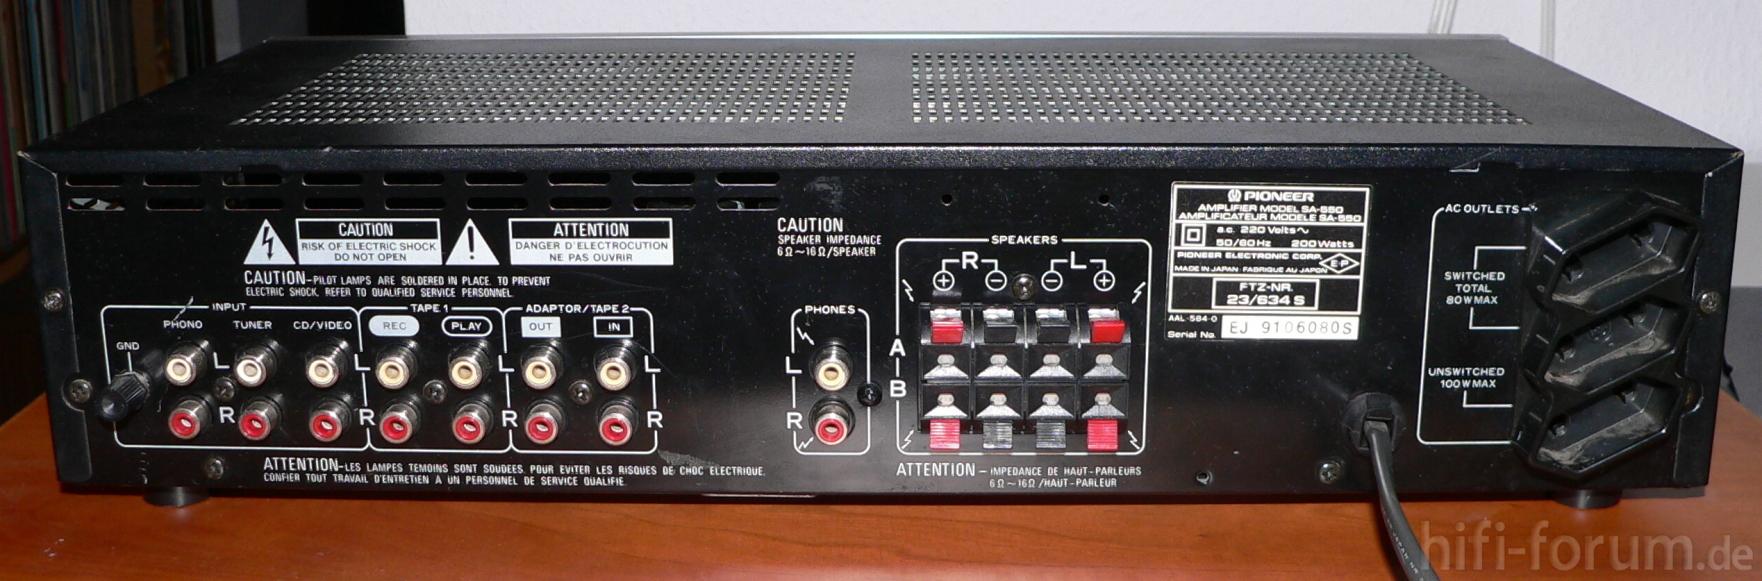 Problema Phono muto amplificatore Pioneer-sa-550-ruckseite_18871